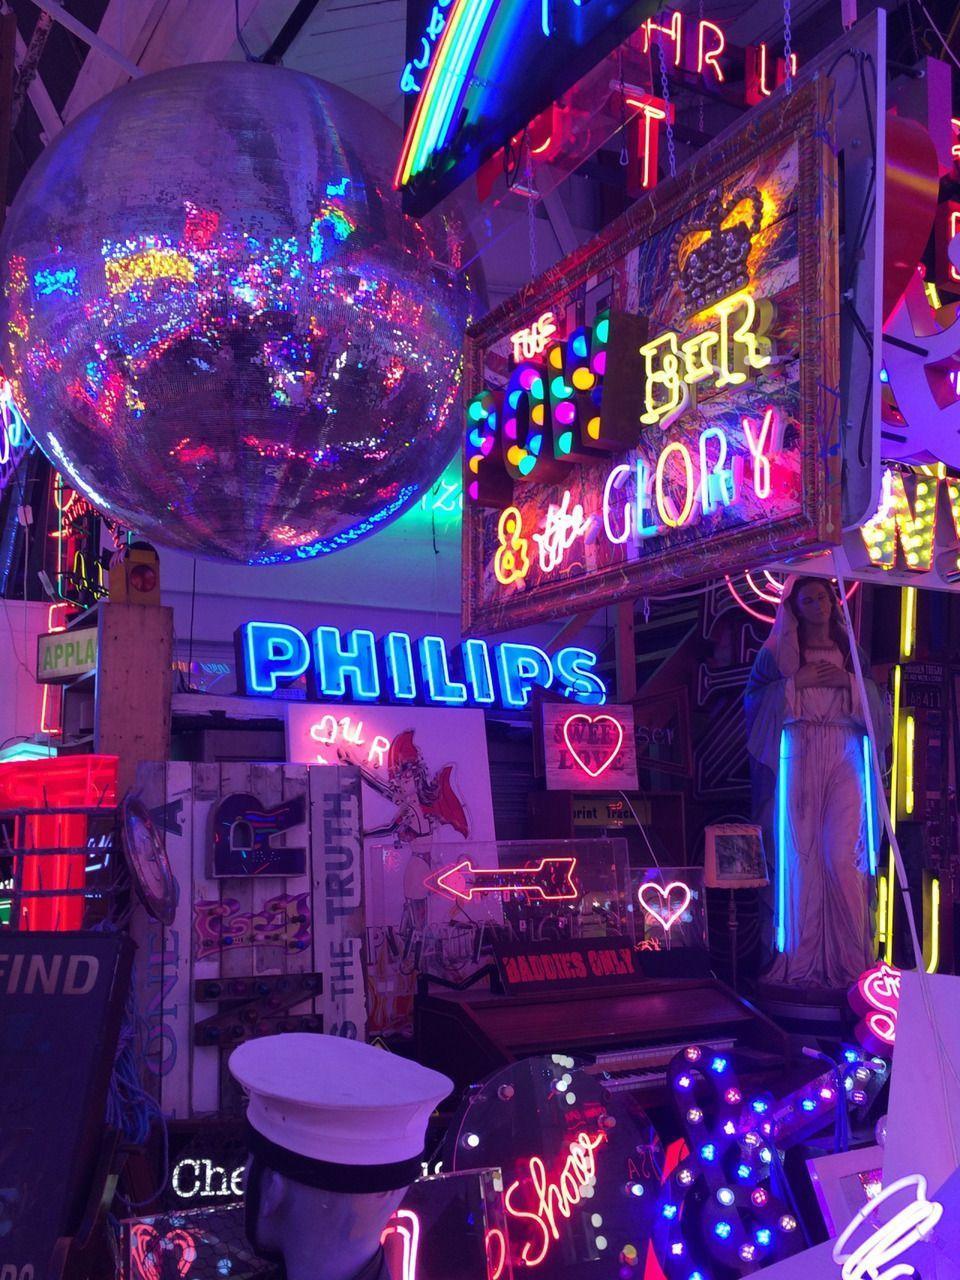 Neon Aesthetic Wallpapers - Top Free Neon Aesthetic ...